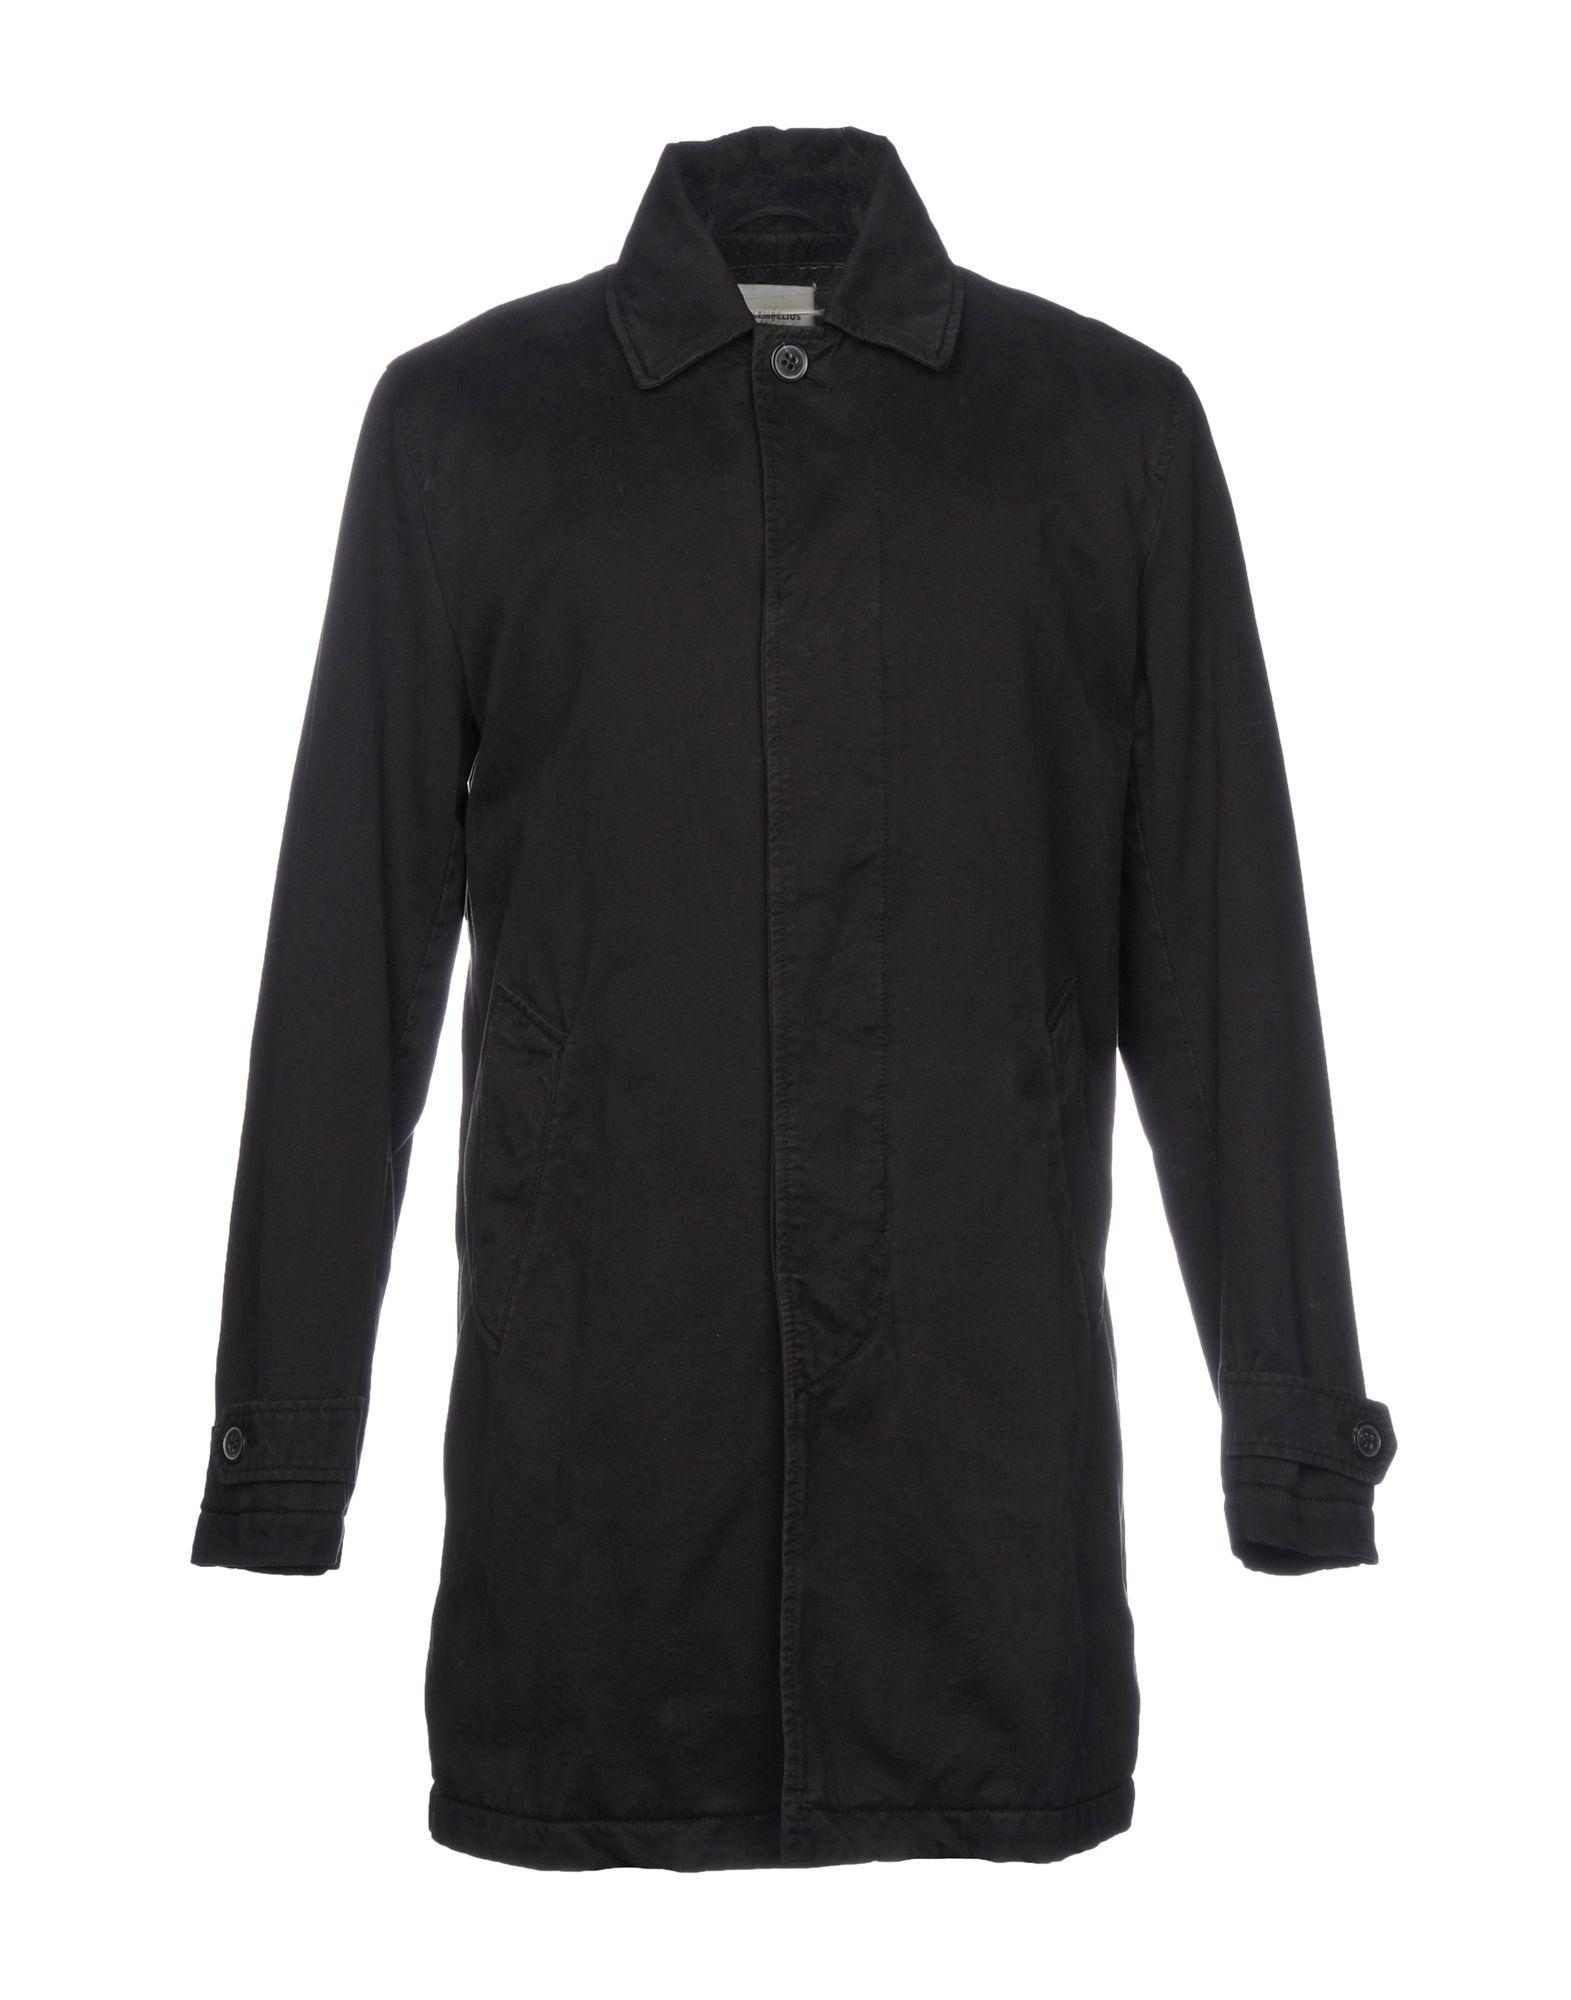 LEMPELIUS Jackets in Black